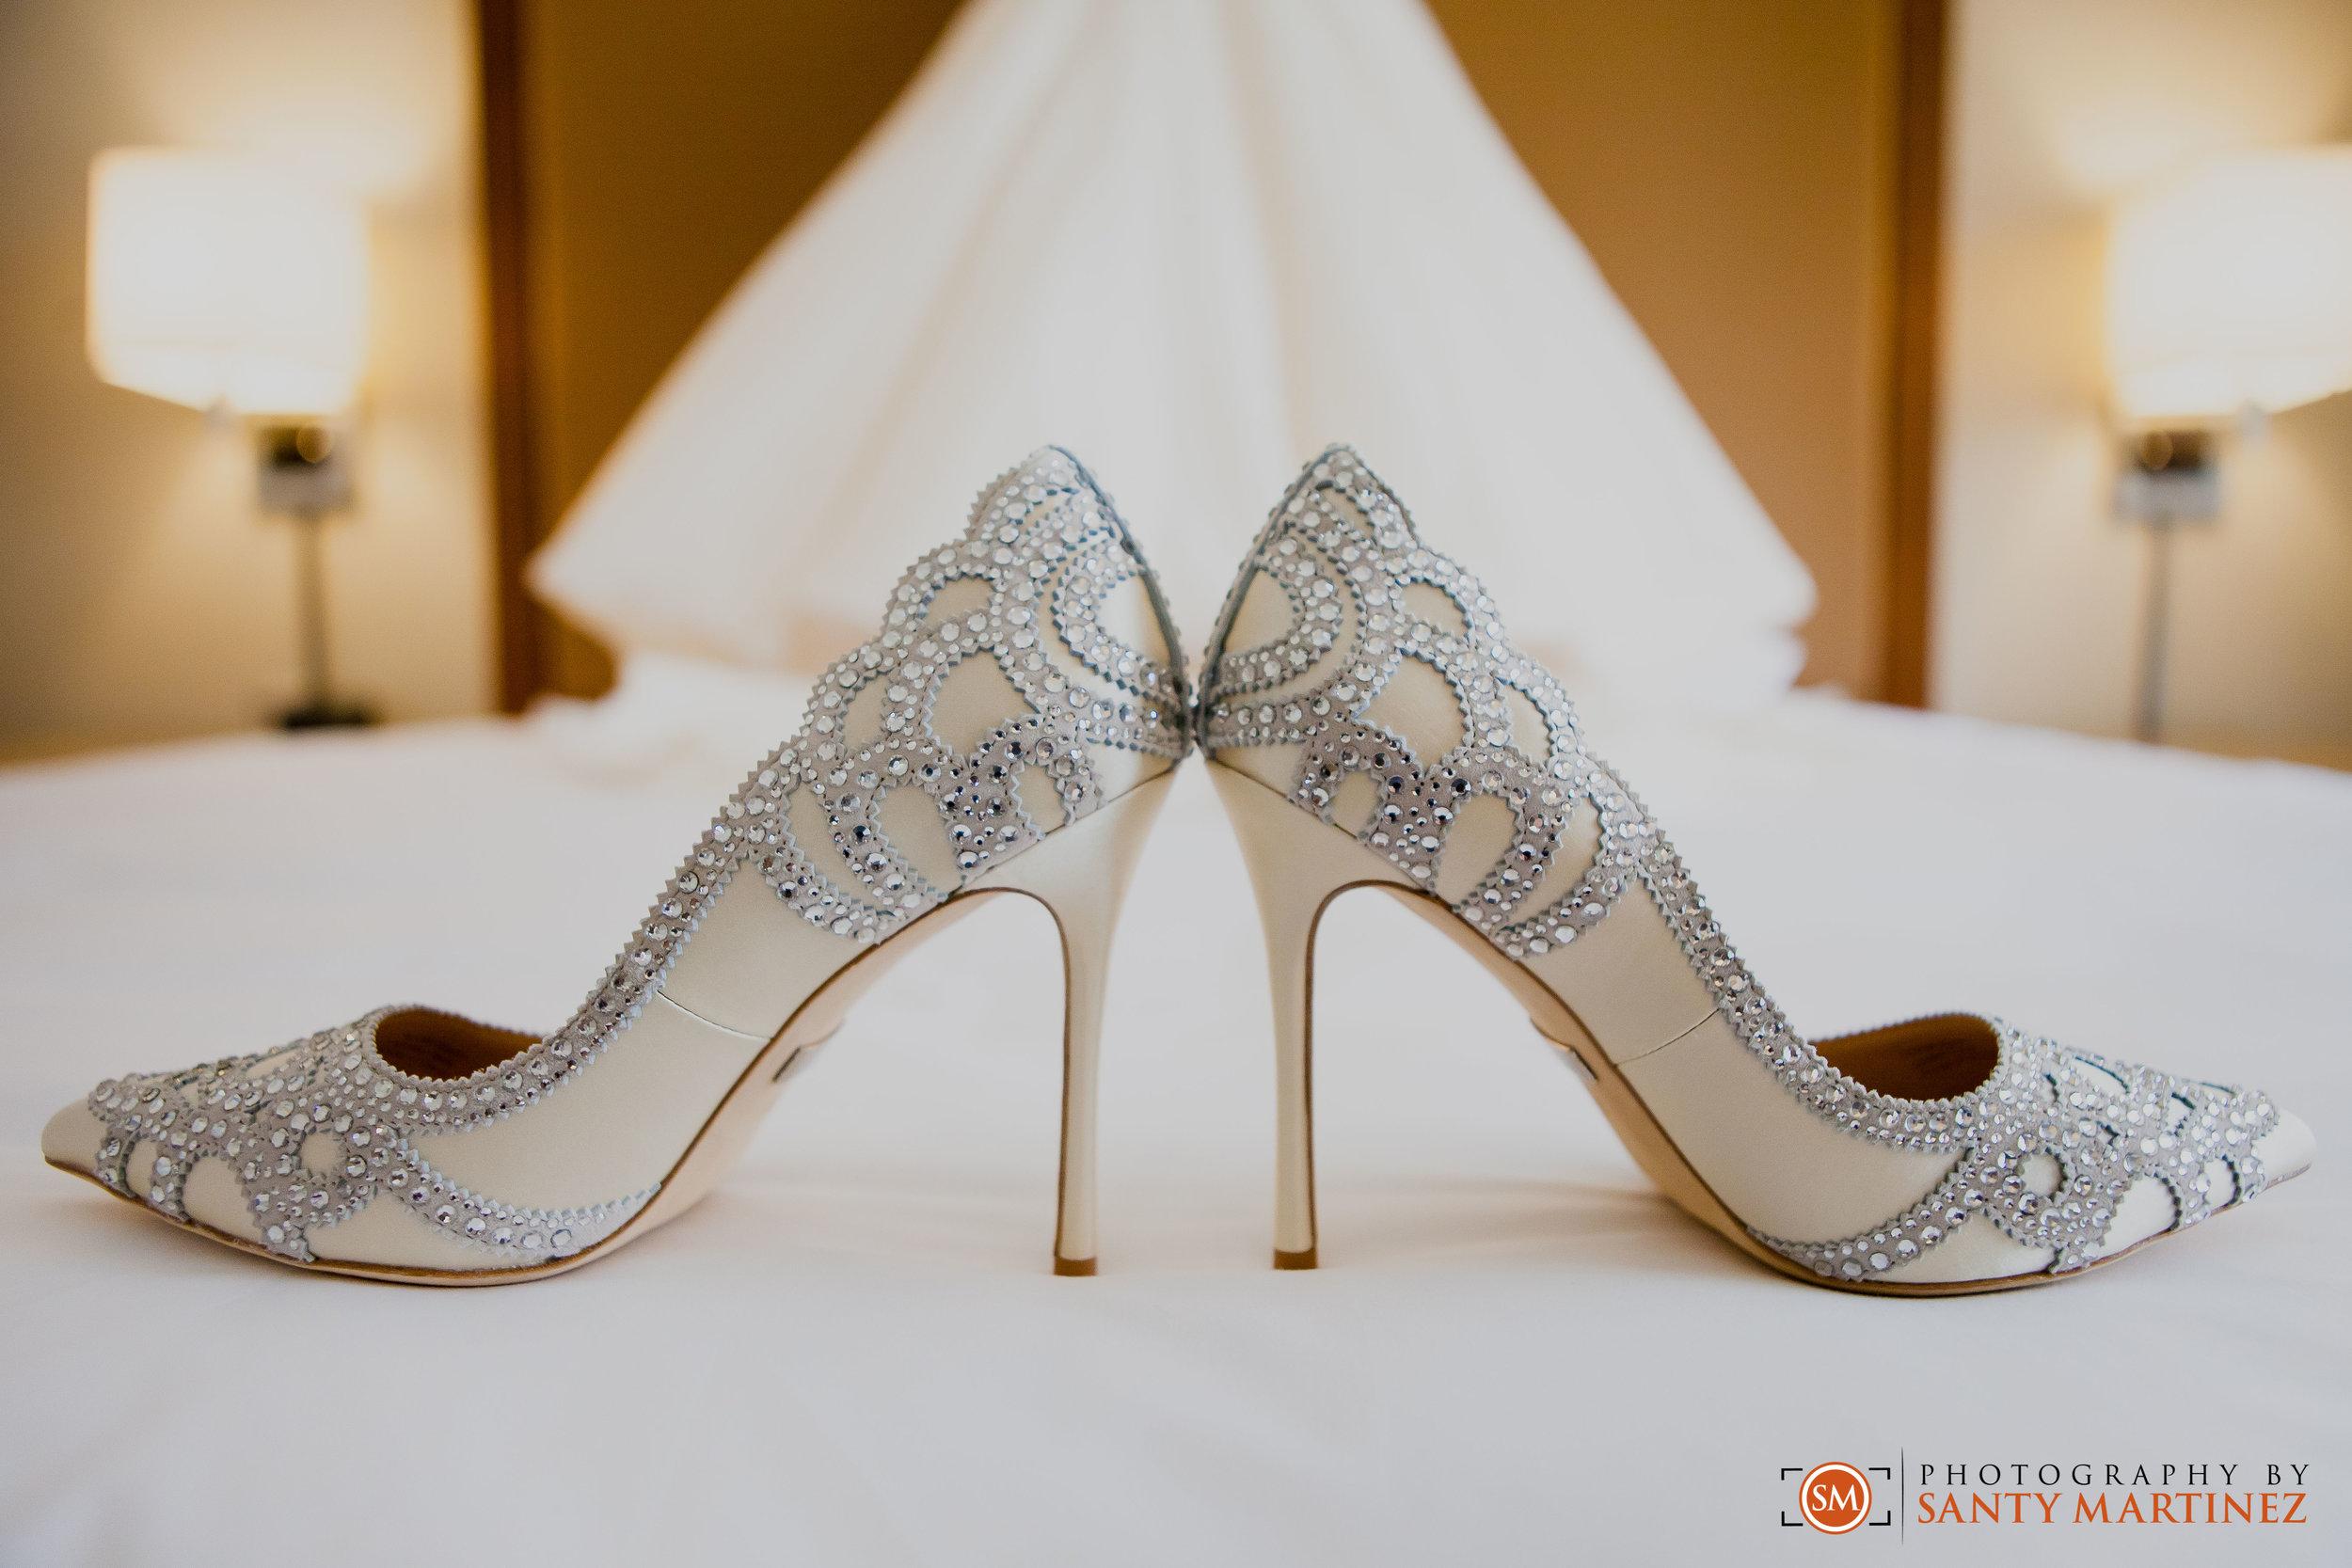 Wedding First Miami Presbyterian Church - Photography by Santy Martinez-2.jpg